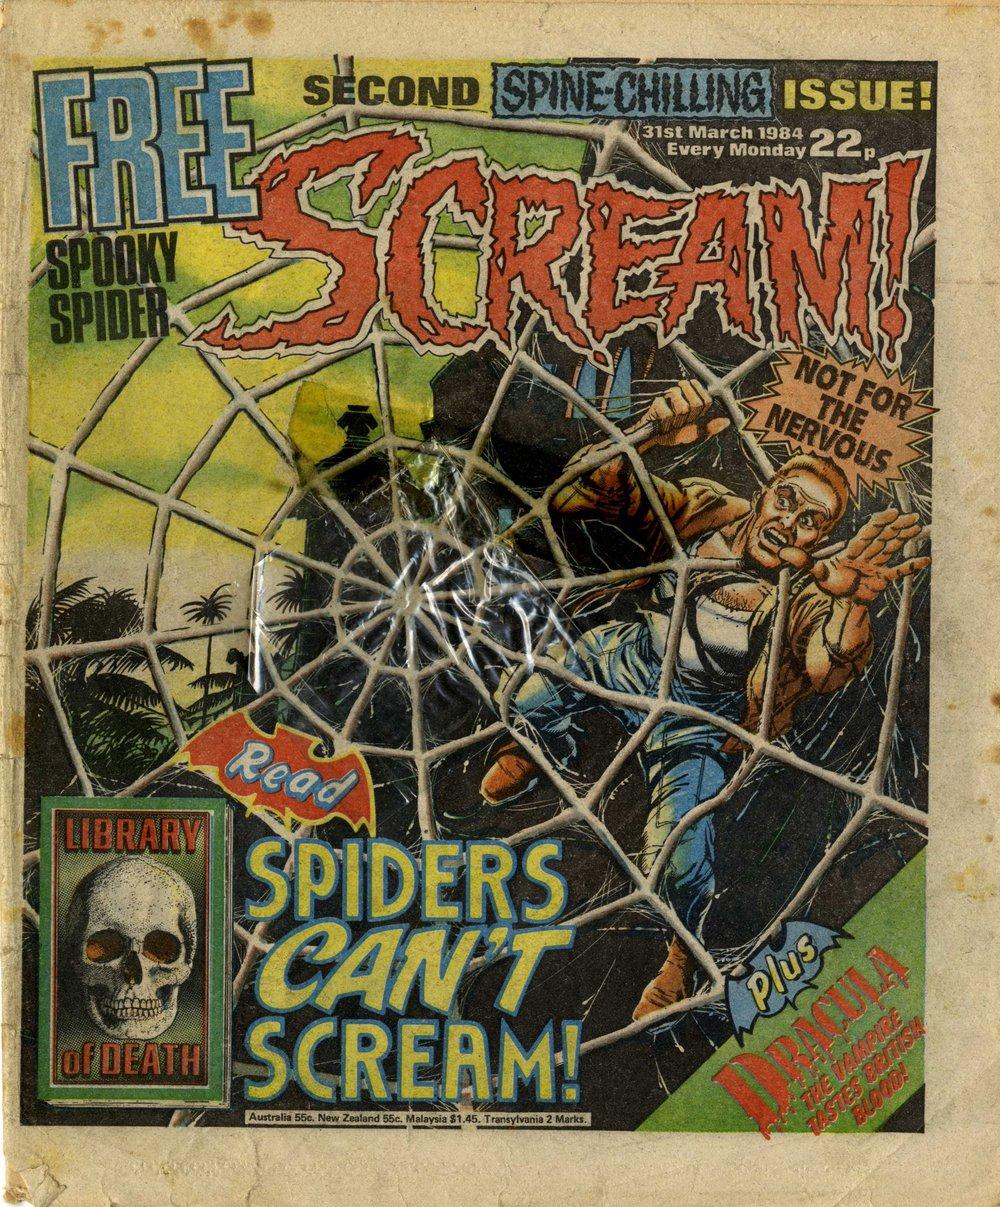 Scream 310384 001.jpg